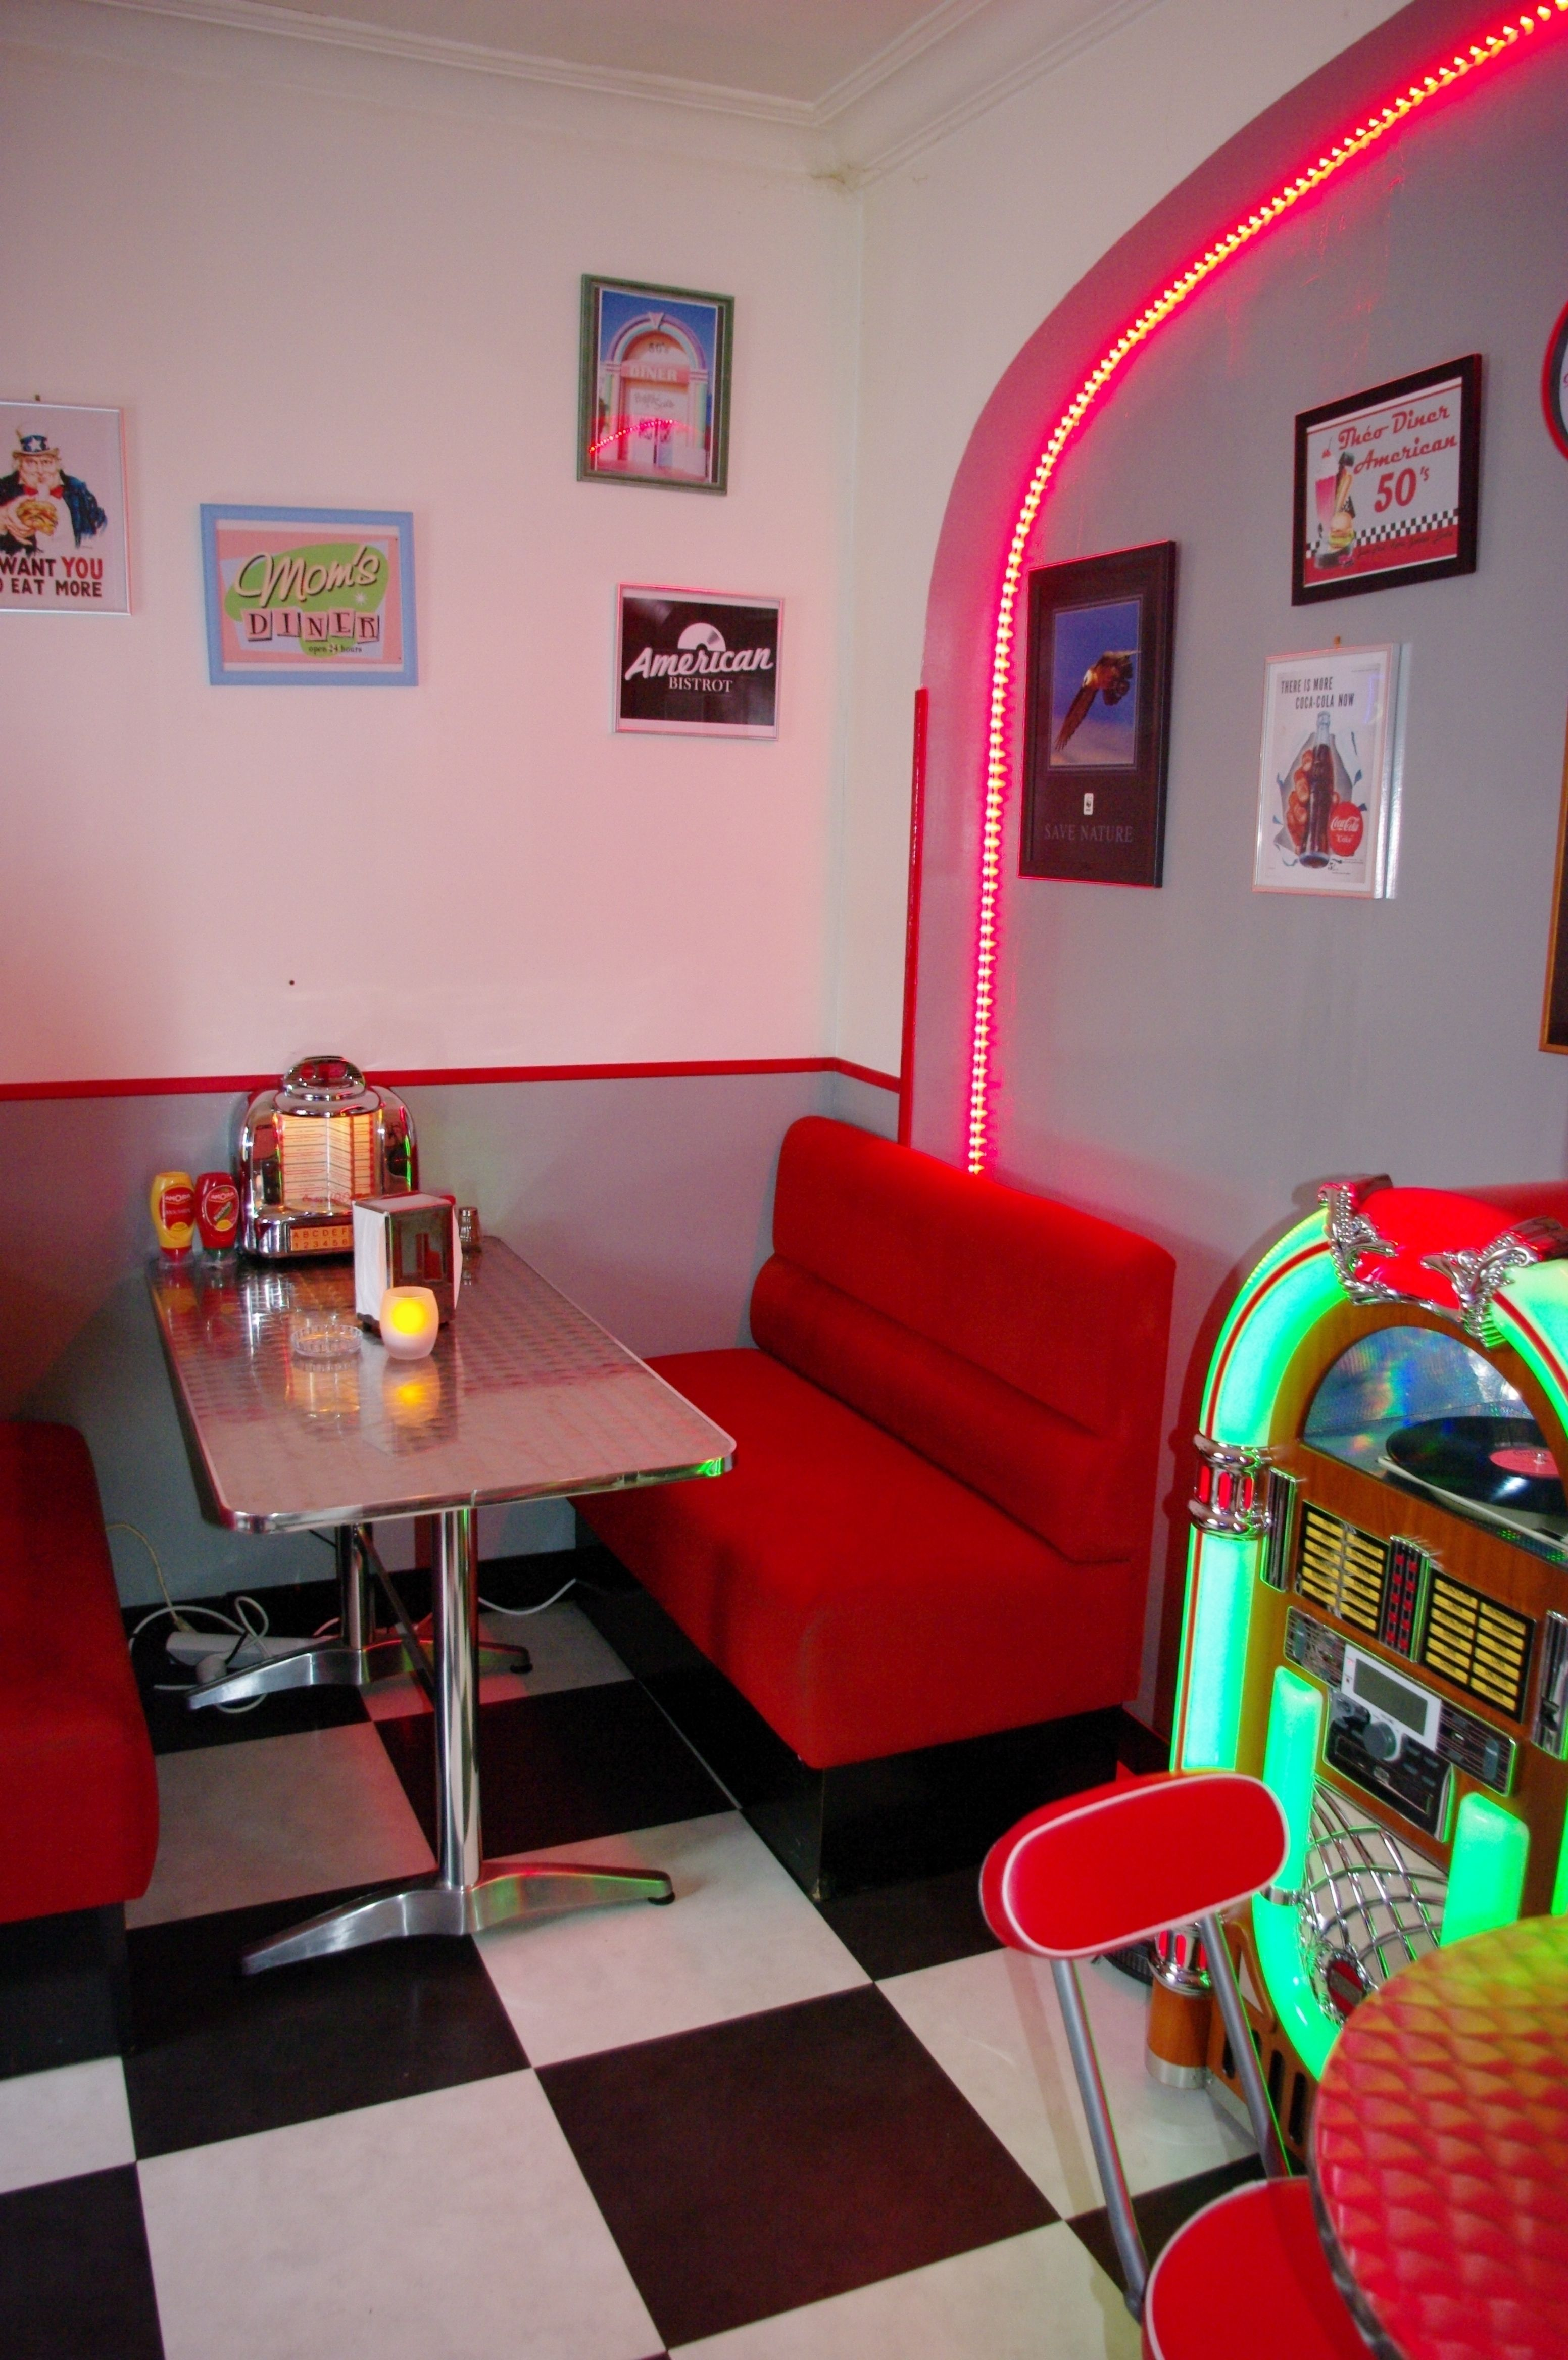 My Dining room diner 50'